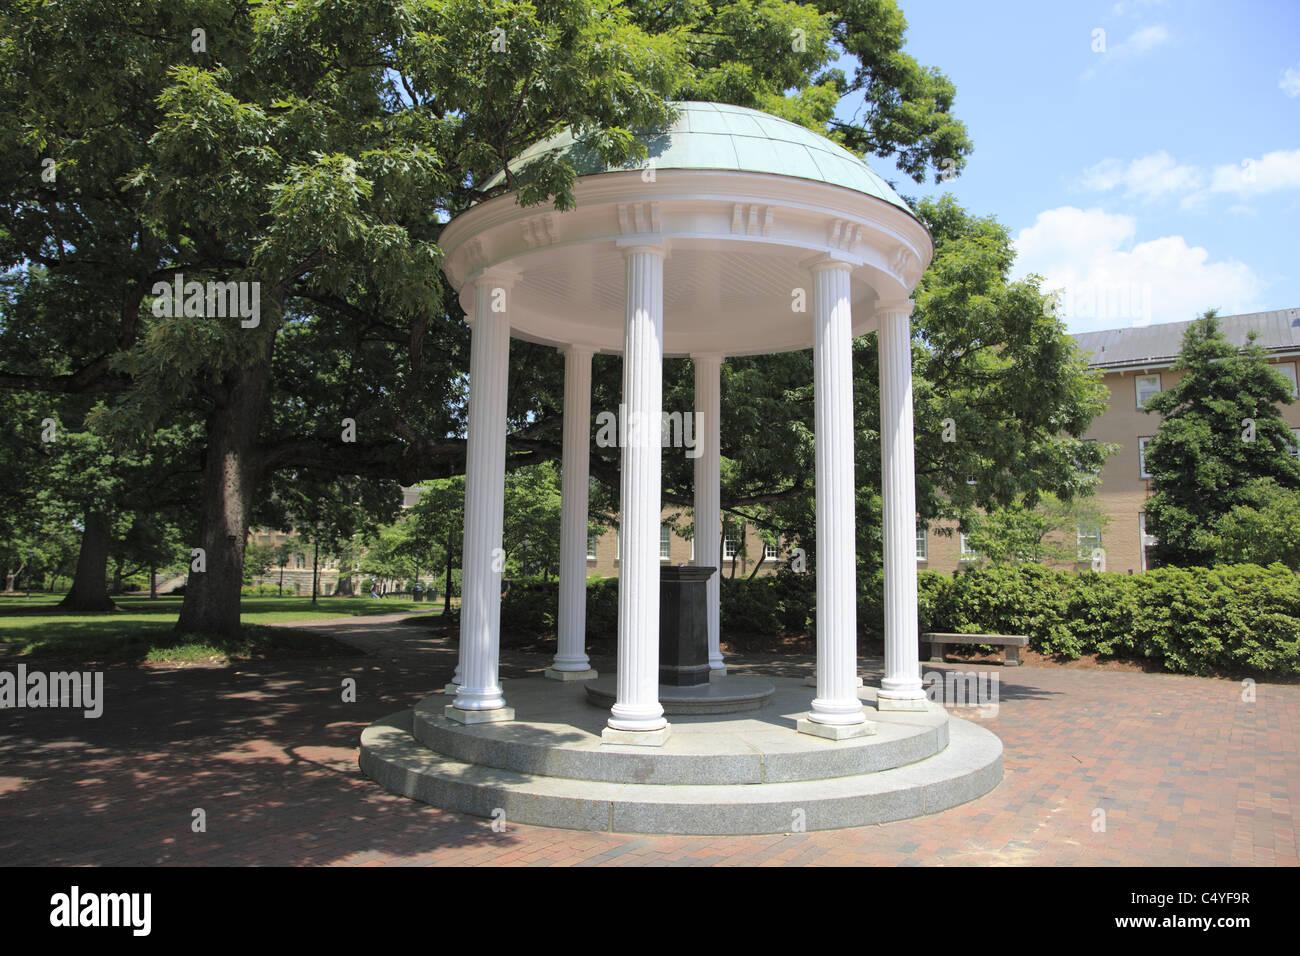 The Old Well, symbol of UNC, University of North Carolina, Chapel Hill, USA - Stock Image